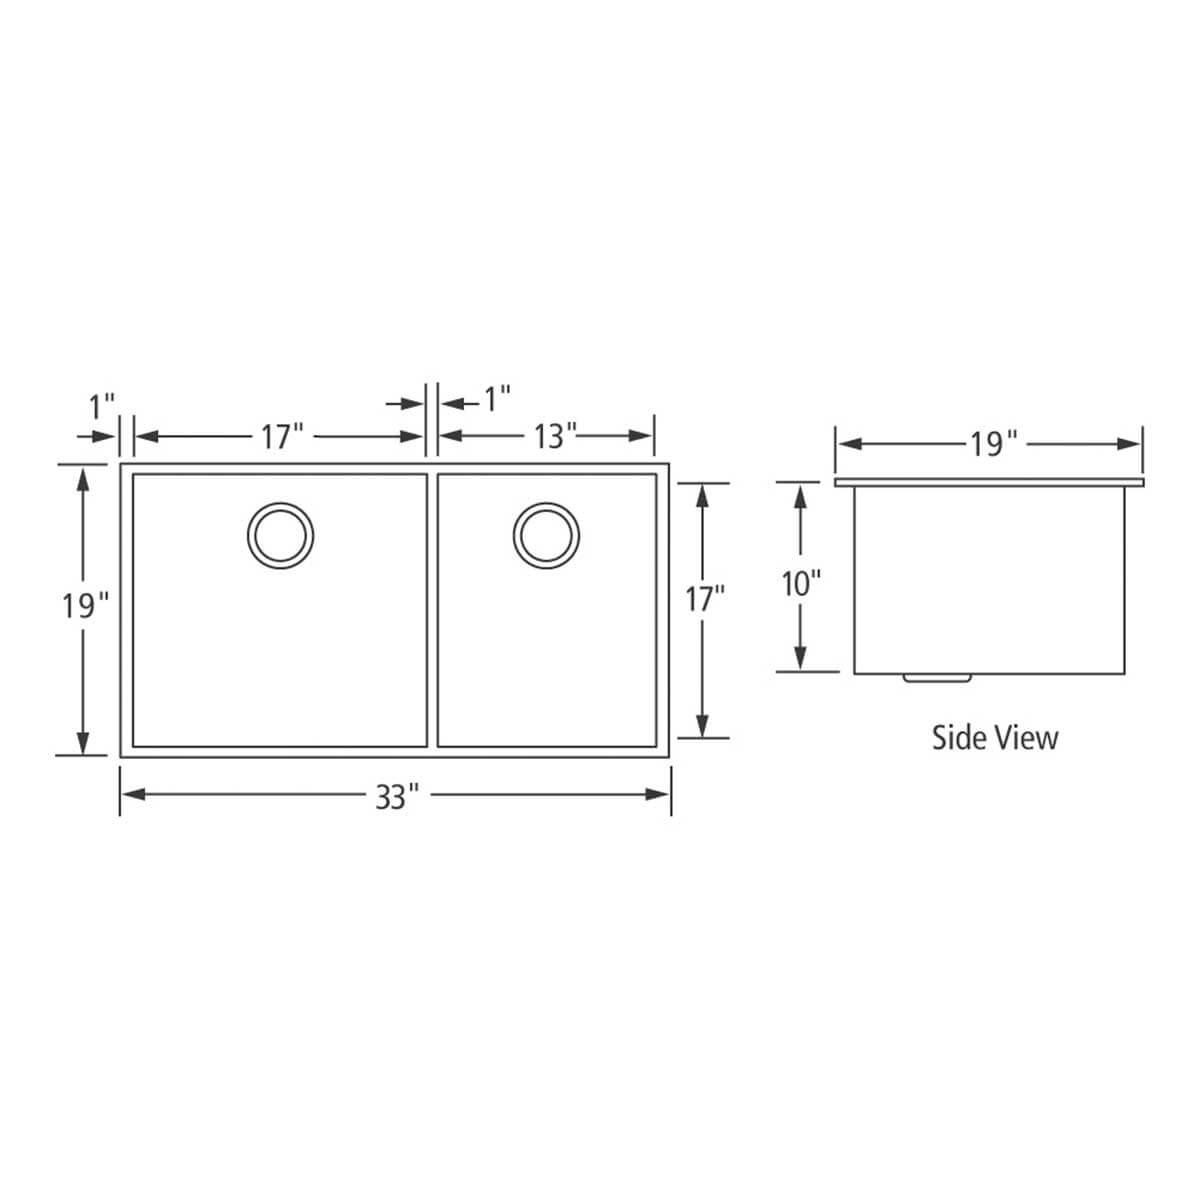 CPUZ3319-D1010 Artisan ChefPro Draw